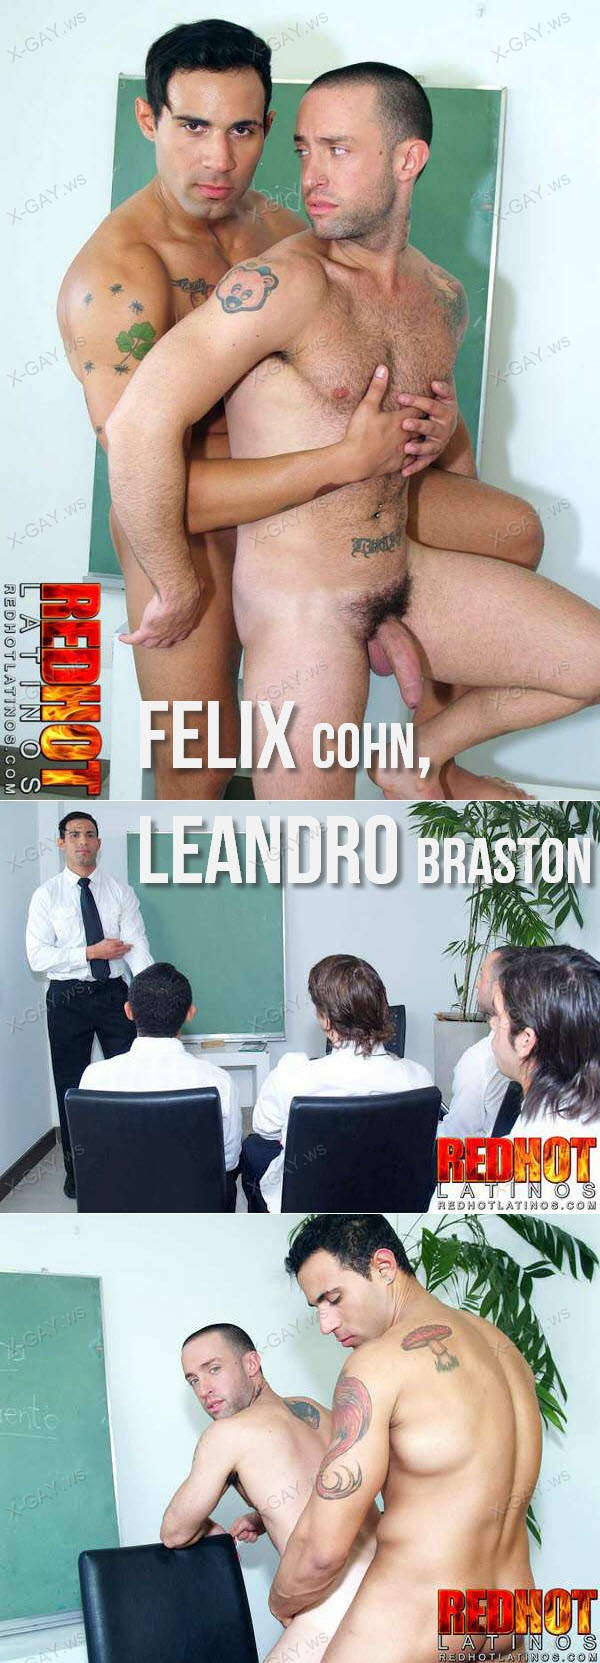 redhotlatinos_felixcohn_leandrobraston.jpg